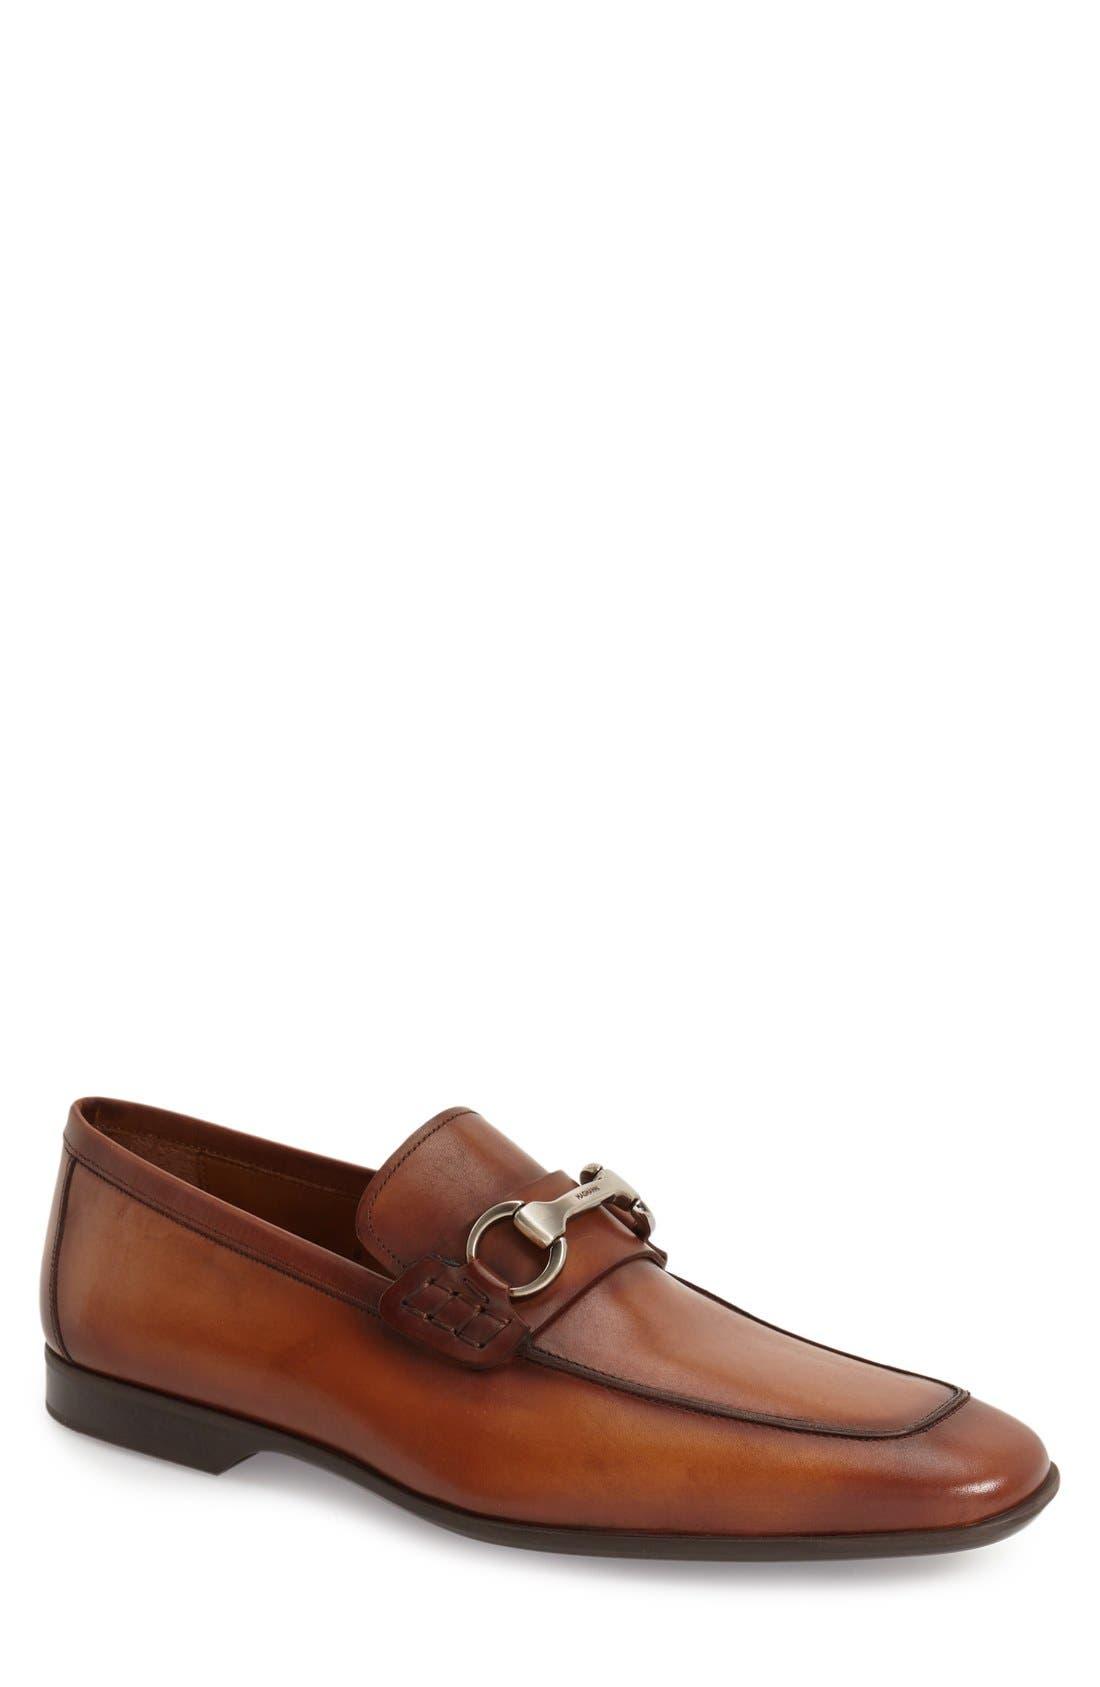 'Rafa II' Bit Loafer,                             Main thumbnail 1, color,                             Cognac Leather